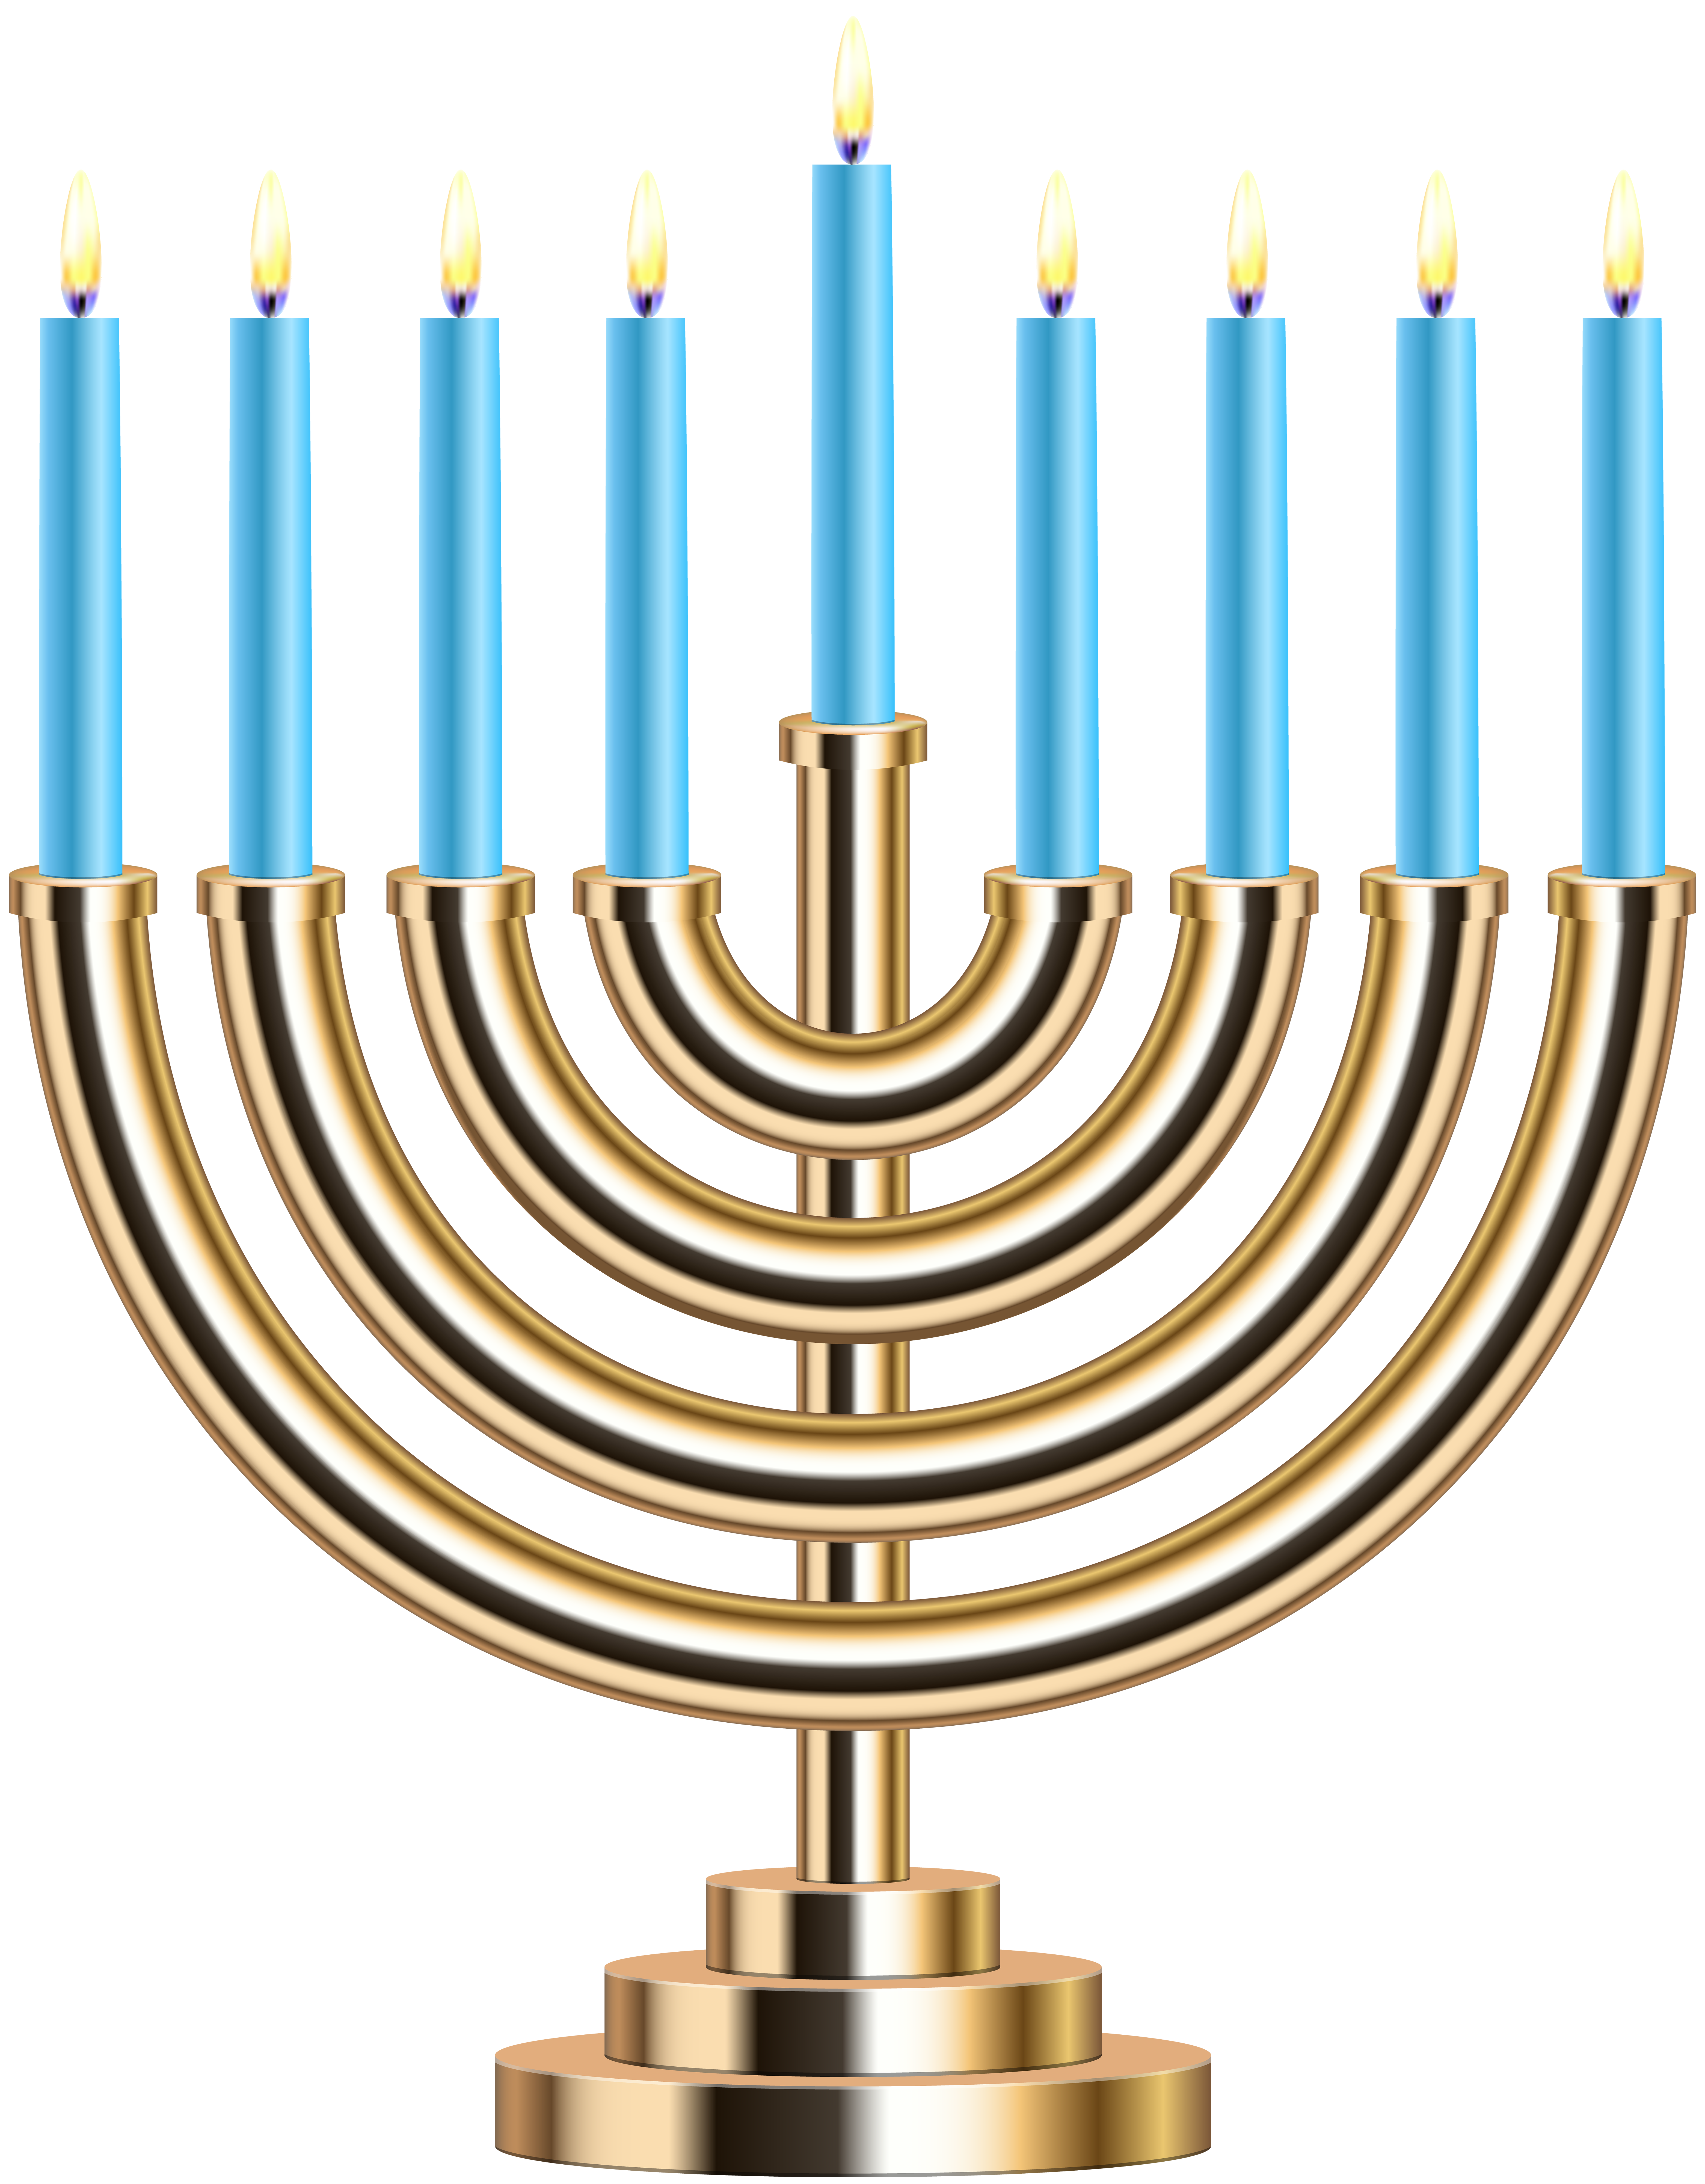 Hanukkah clipart chrismukkah. Gold menorah png clip